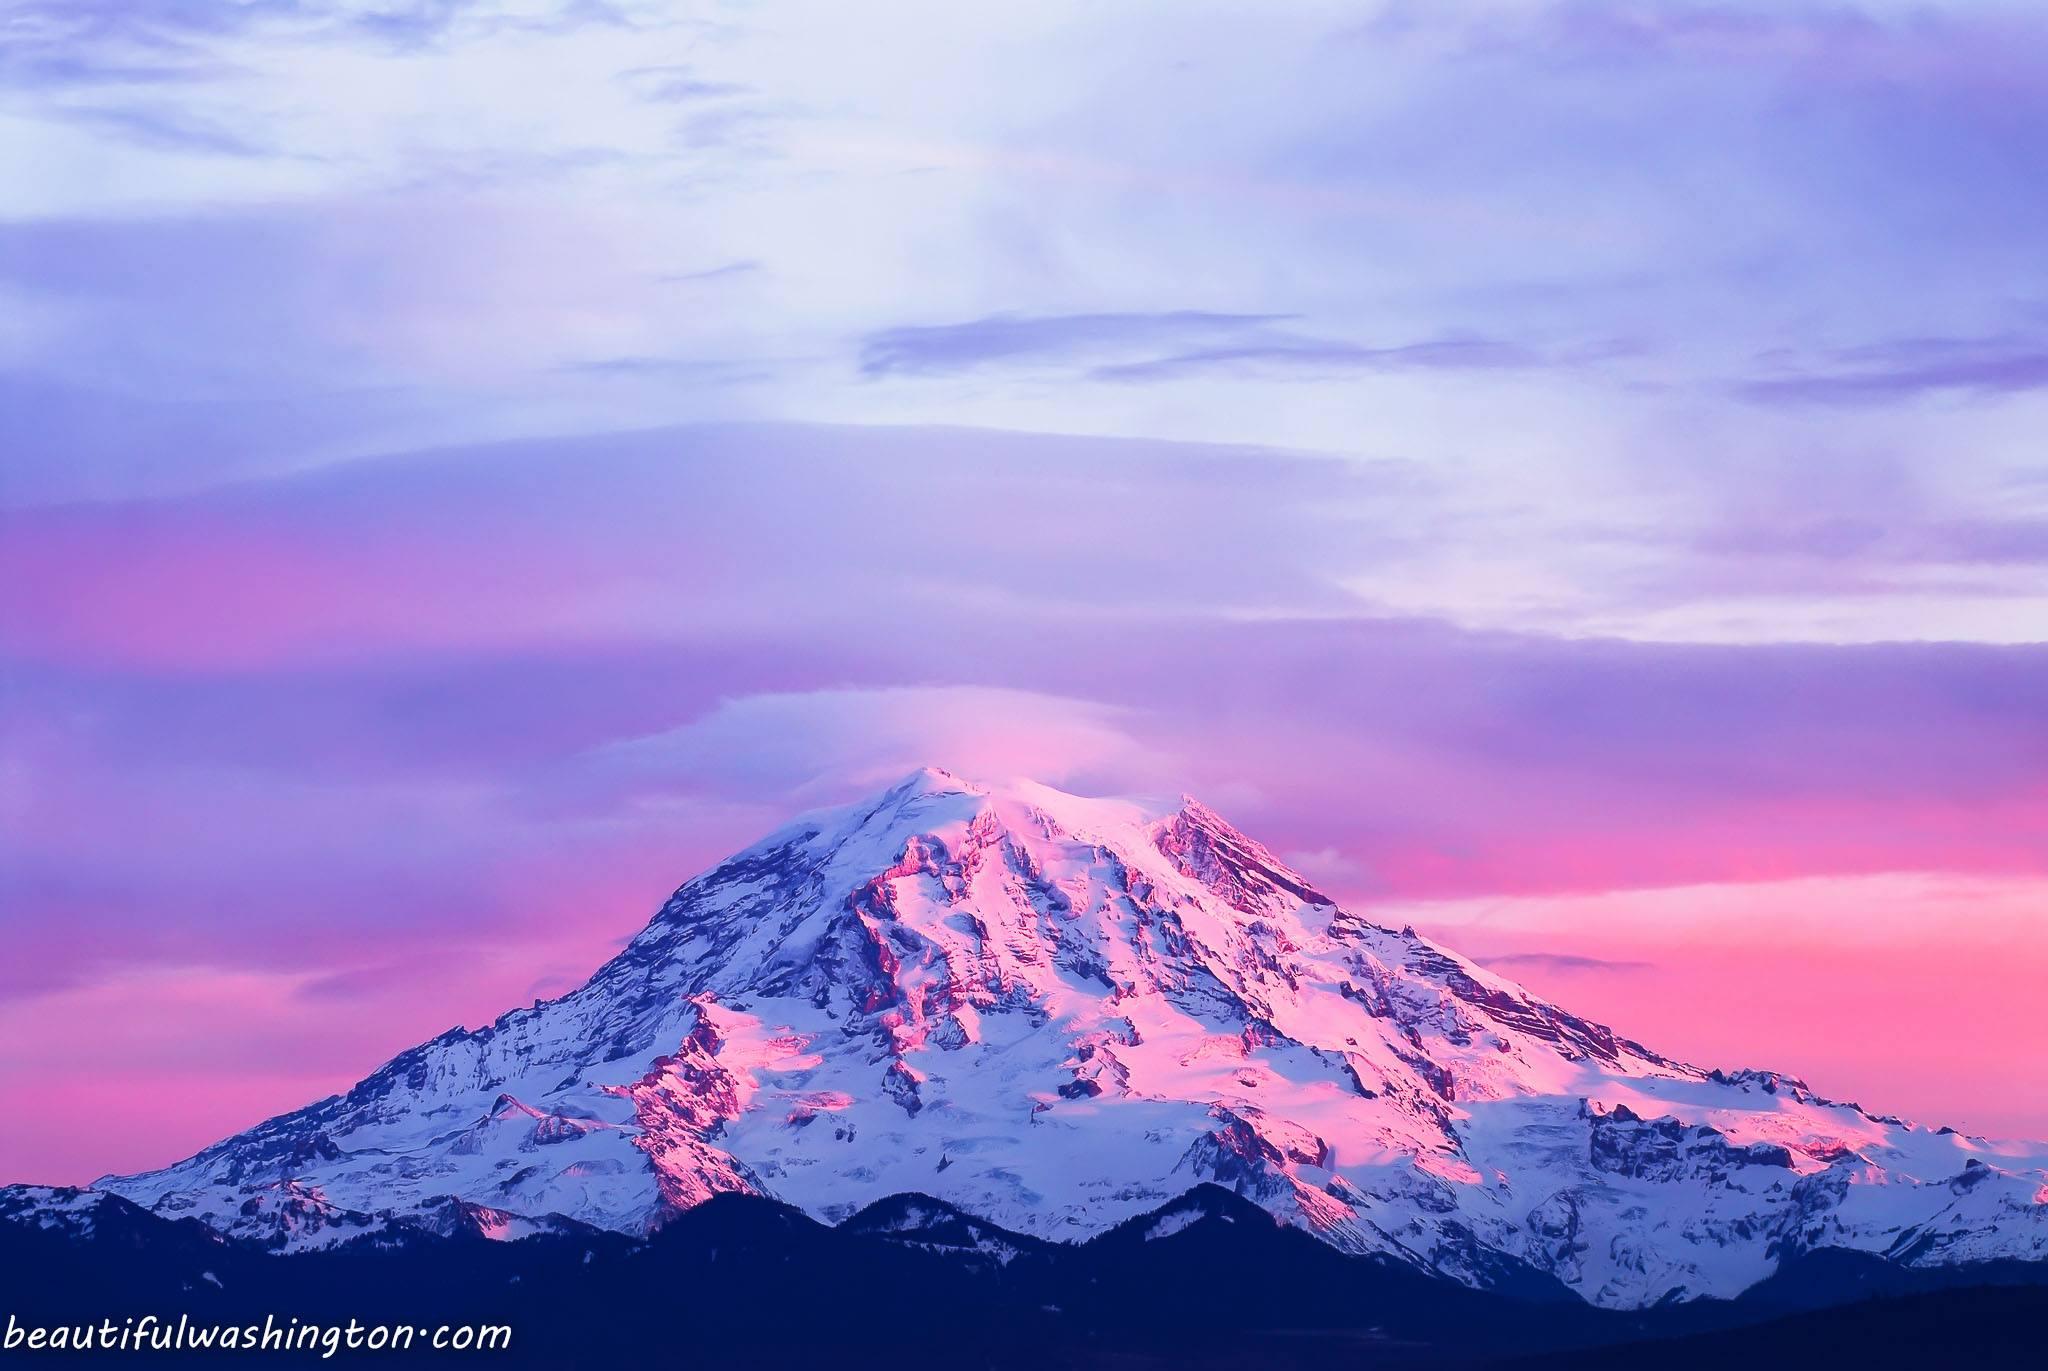 Mount Rainier National Park: 10 tips for visiting the park